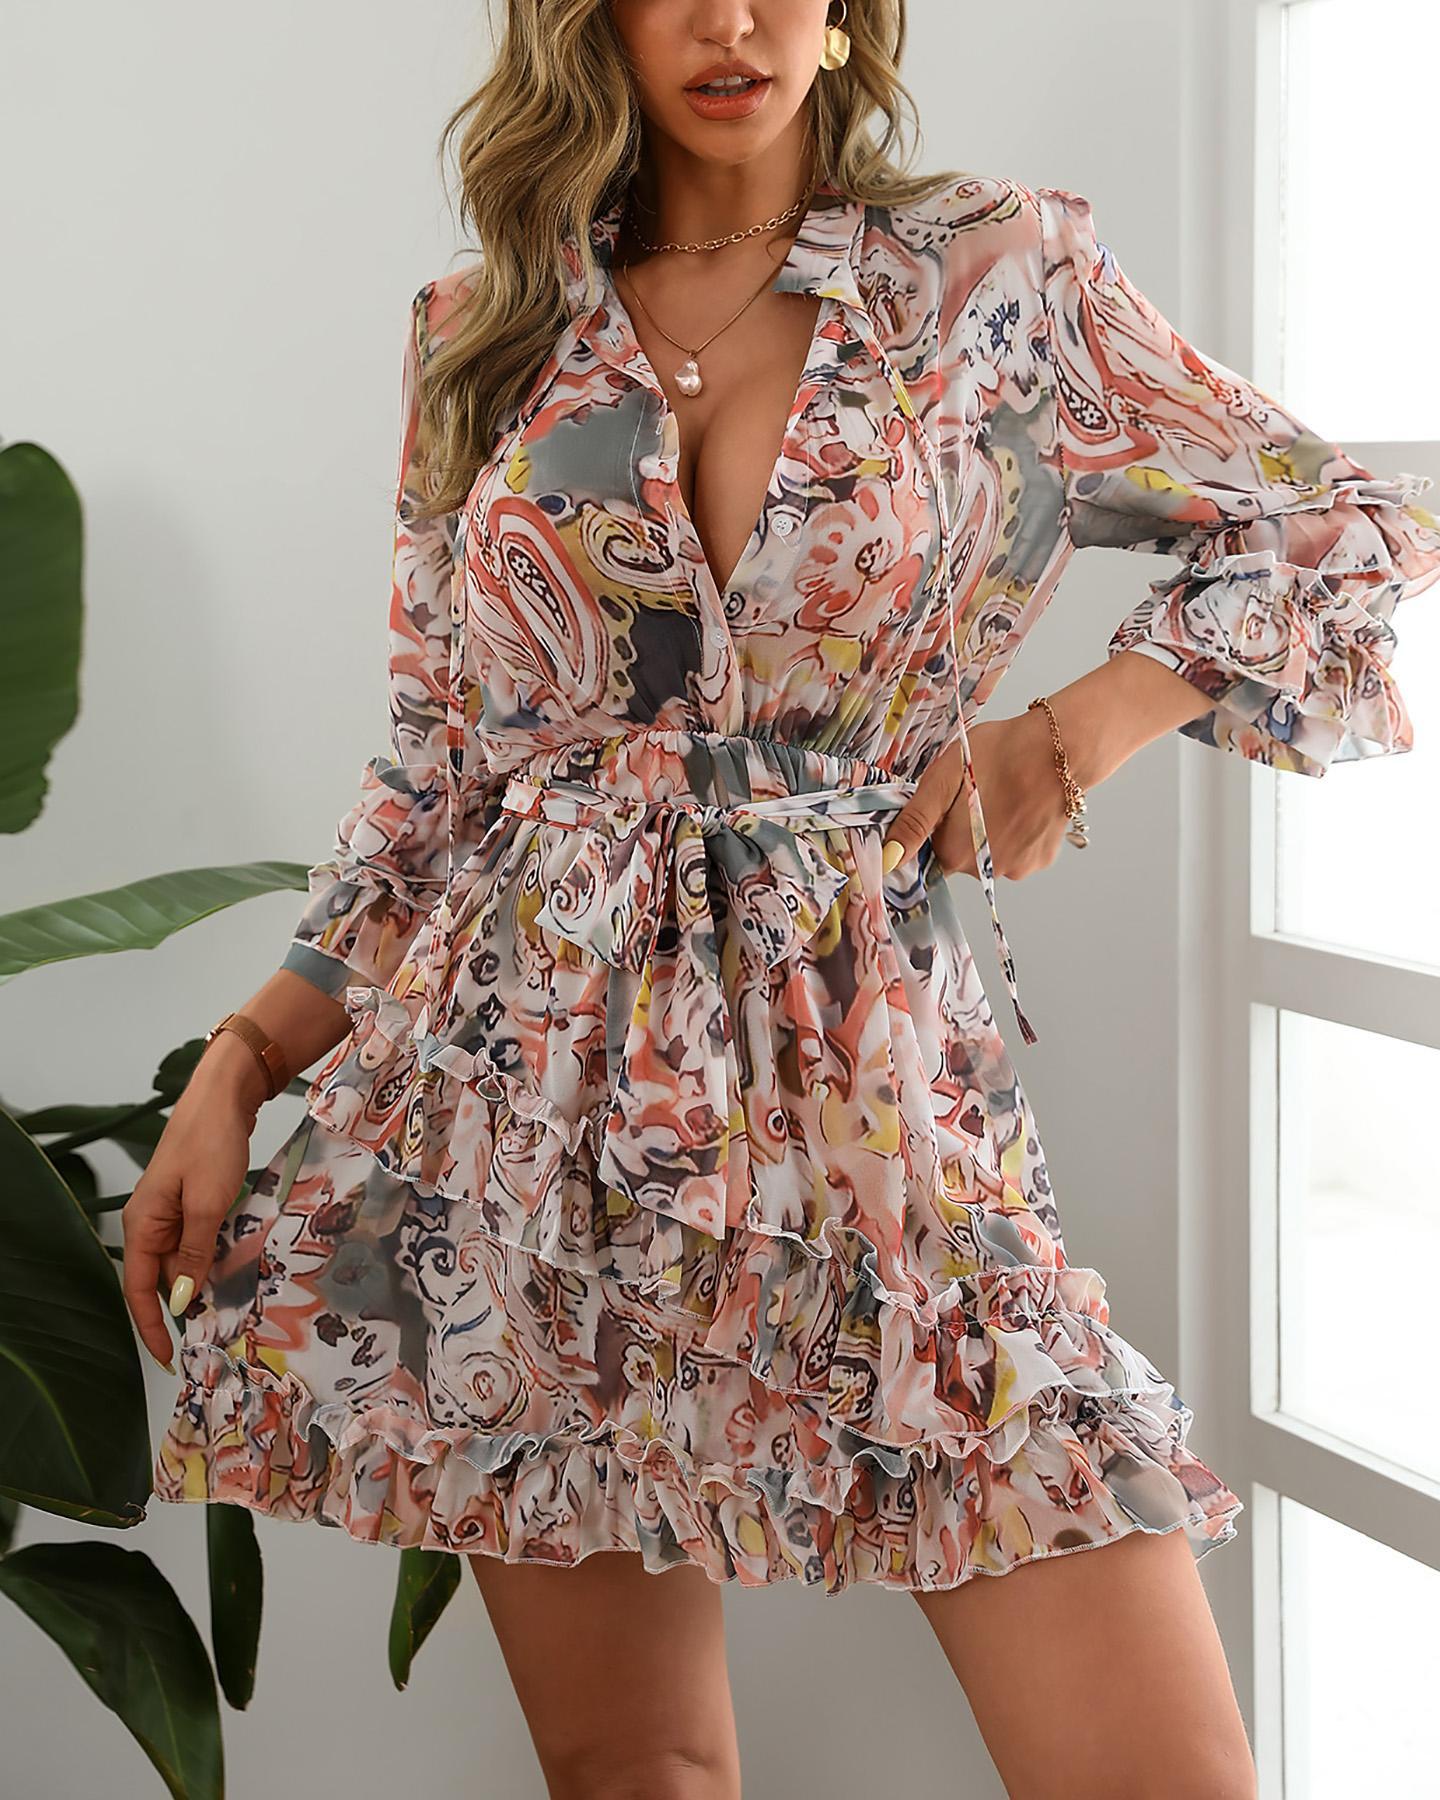 Floral Print Layered Ruffle Mini Dress